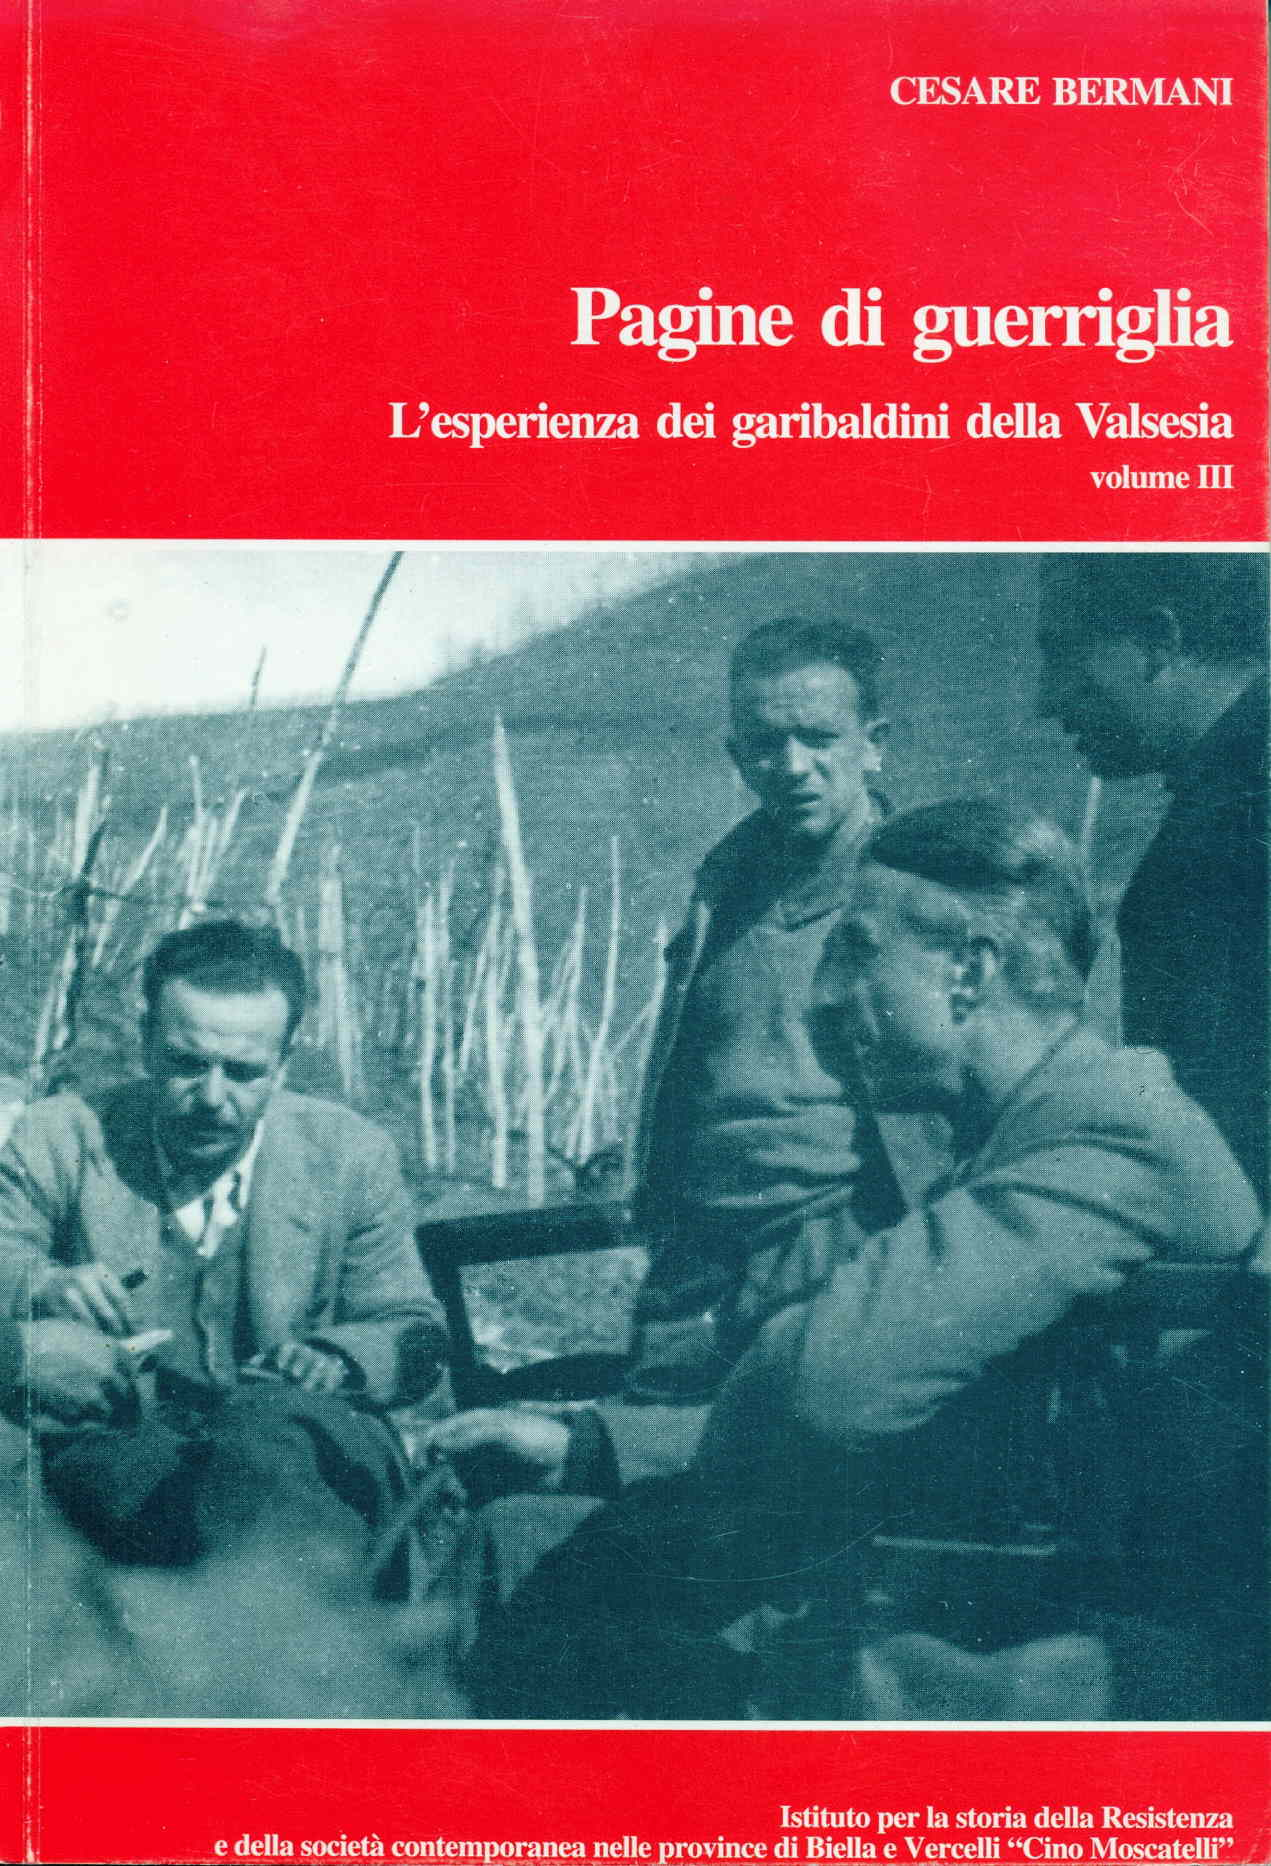 Pagine di guerriglia III